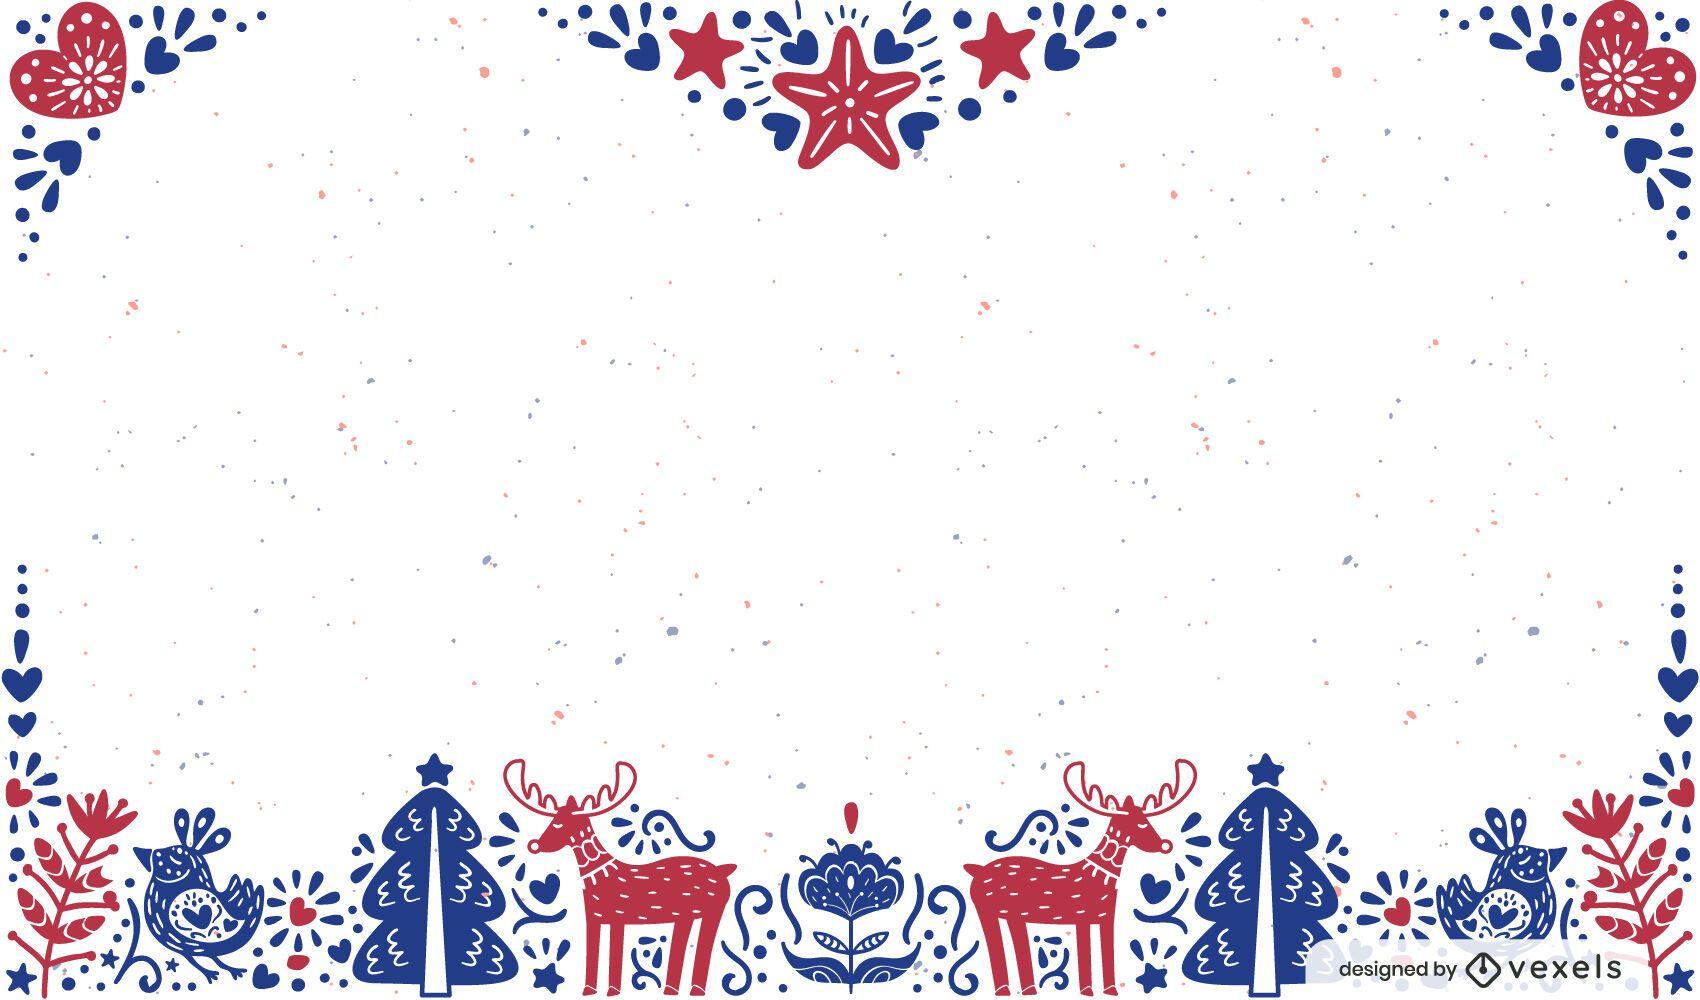 Christmas frame background design